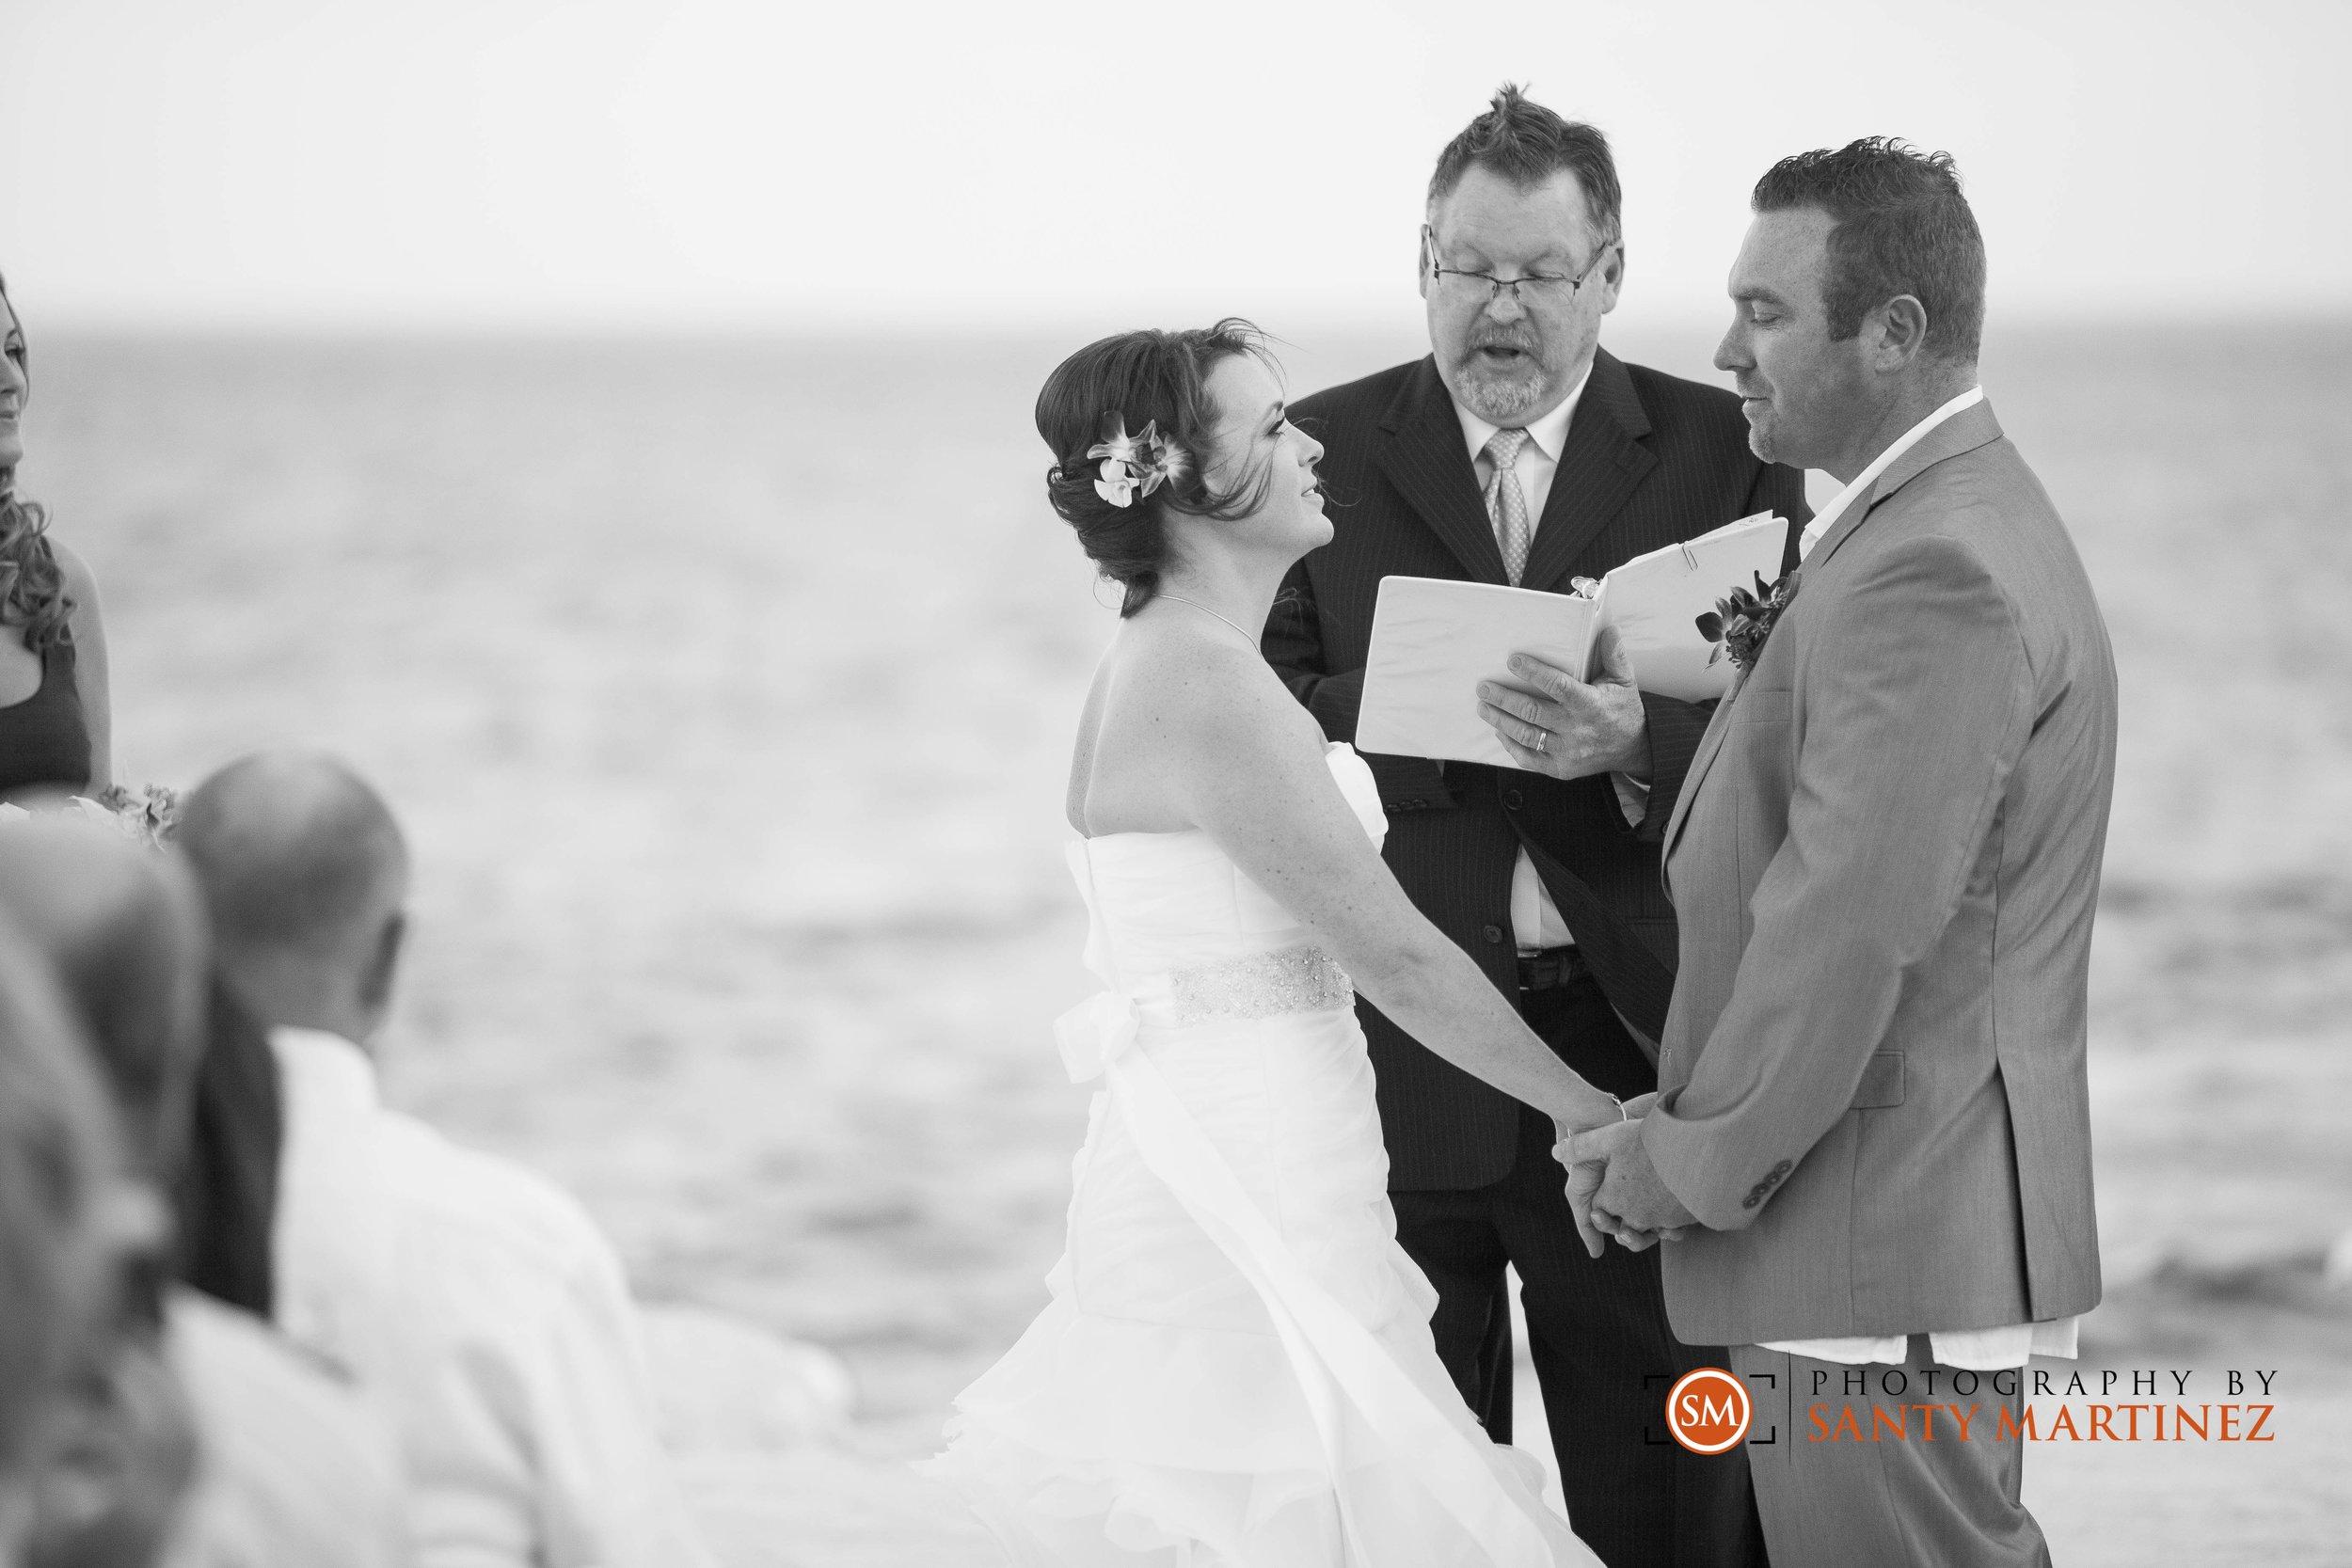 Photography by Santy Martinez - Miami Wedding Photographer-035.jpg